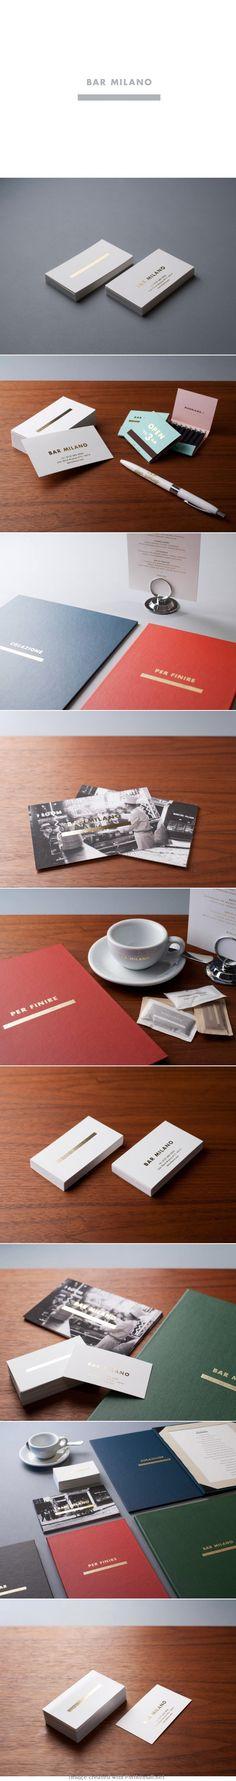 Bar Milano logo corporate branding visual graphic identity bar restaurant design business card gold foil print